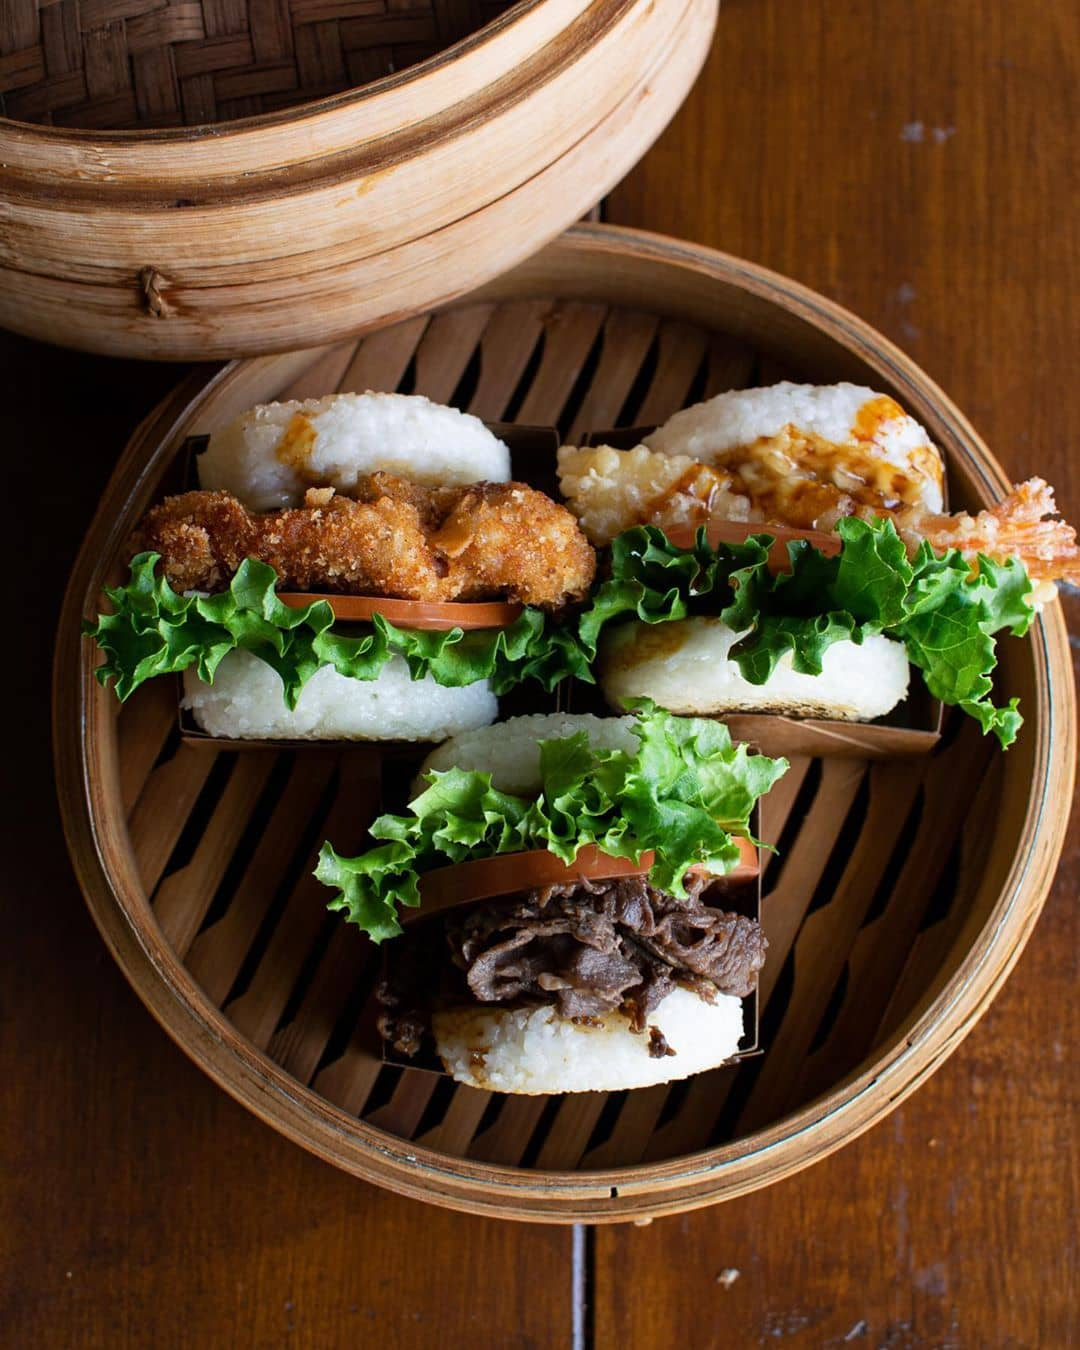 Rice Burgers in basket